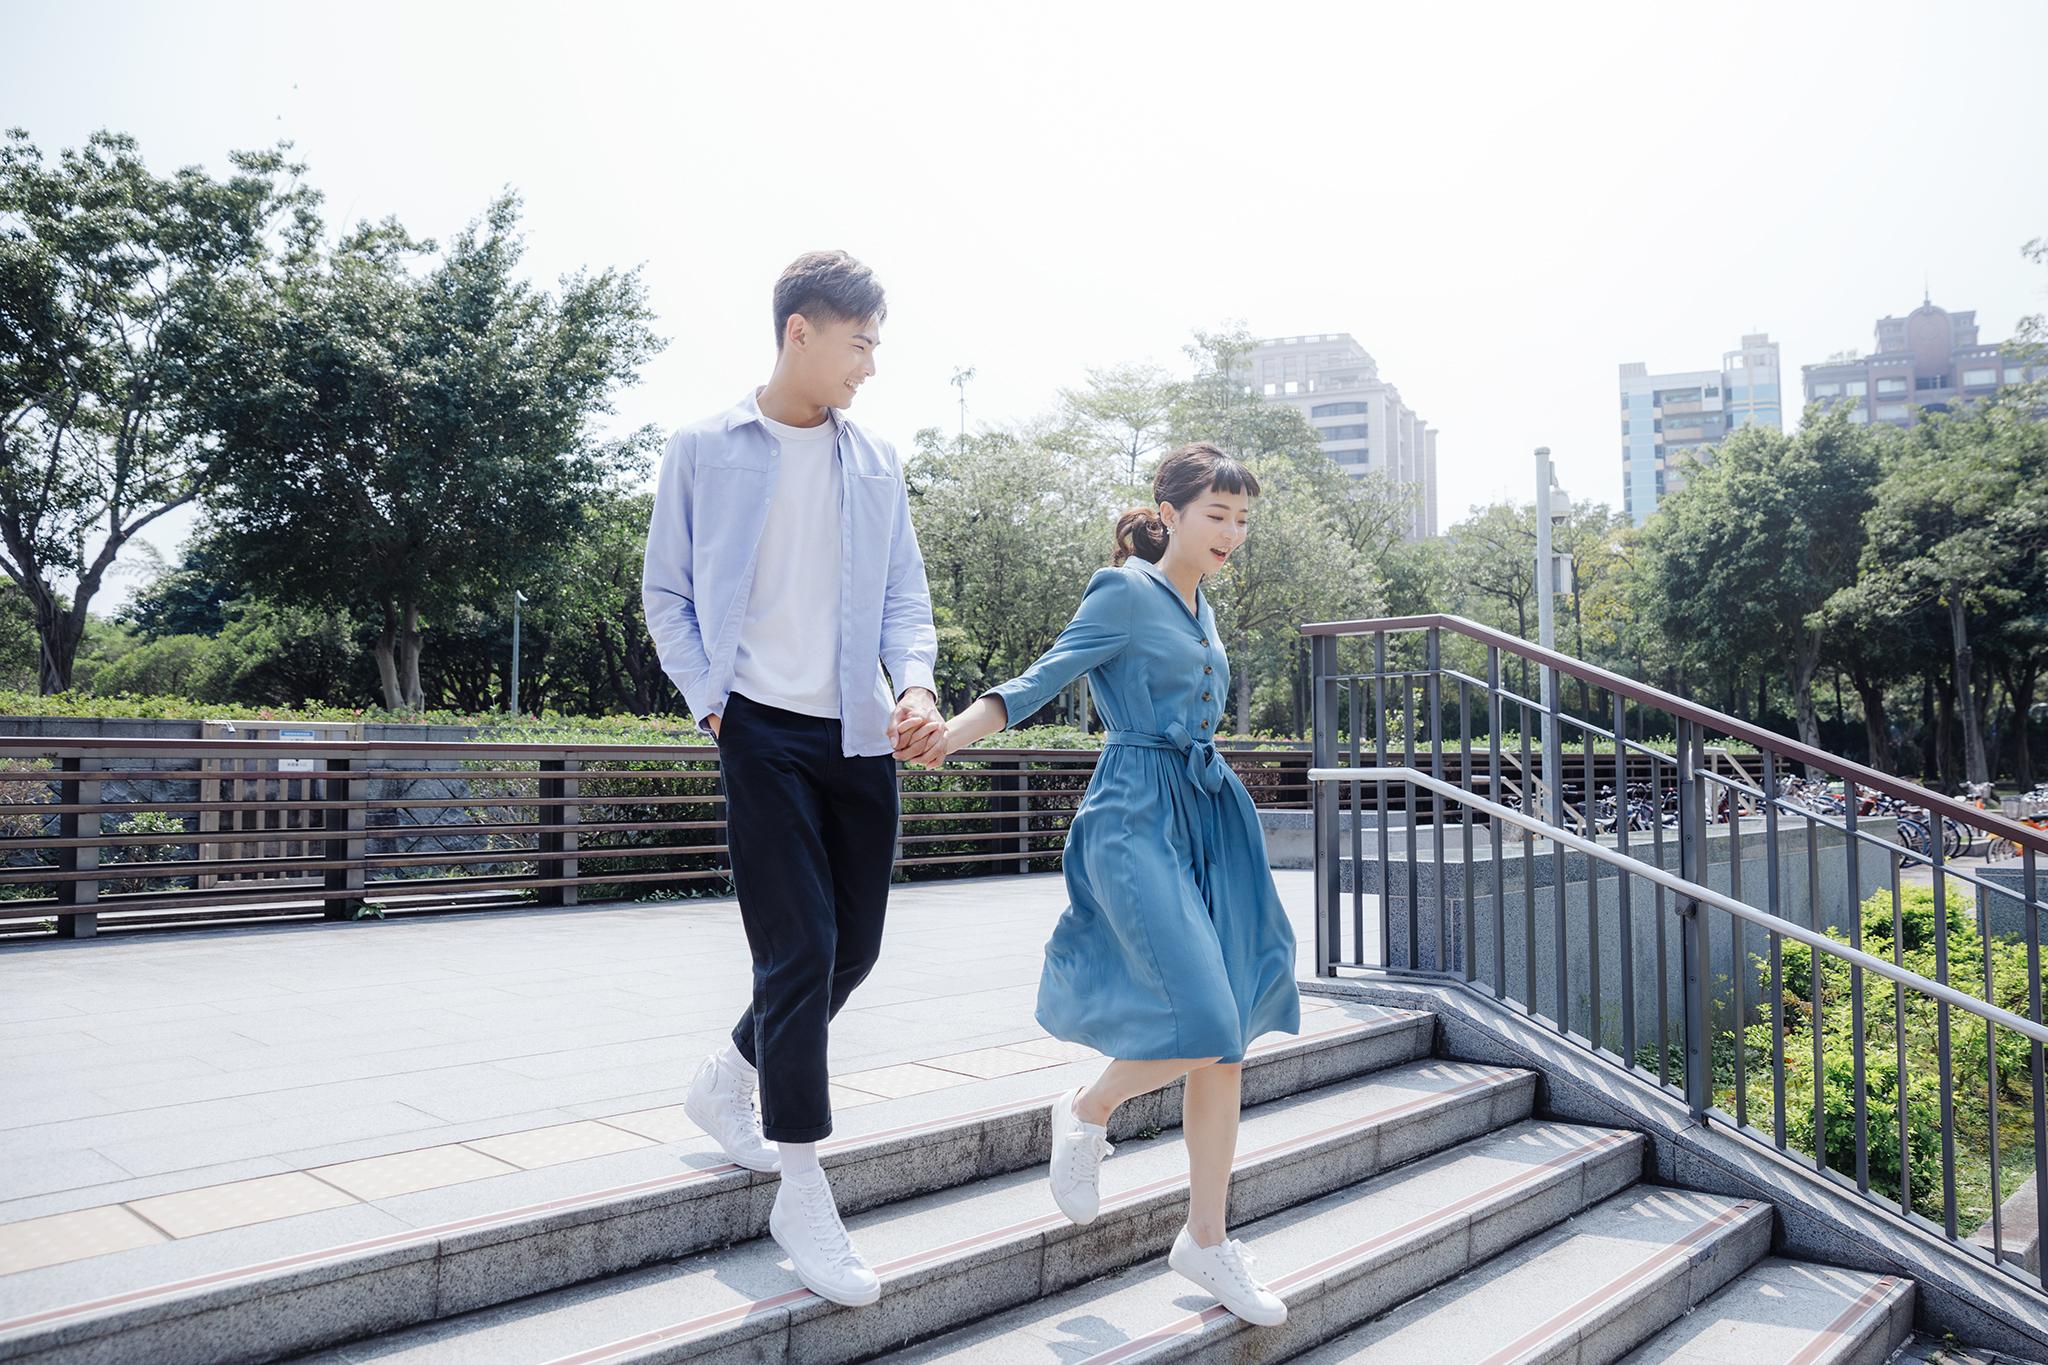 49818352882 3bb5f48fb0 o - 【自助婚紗】+允宥&珮嘉+